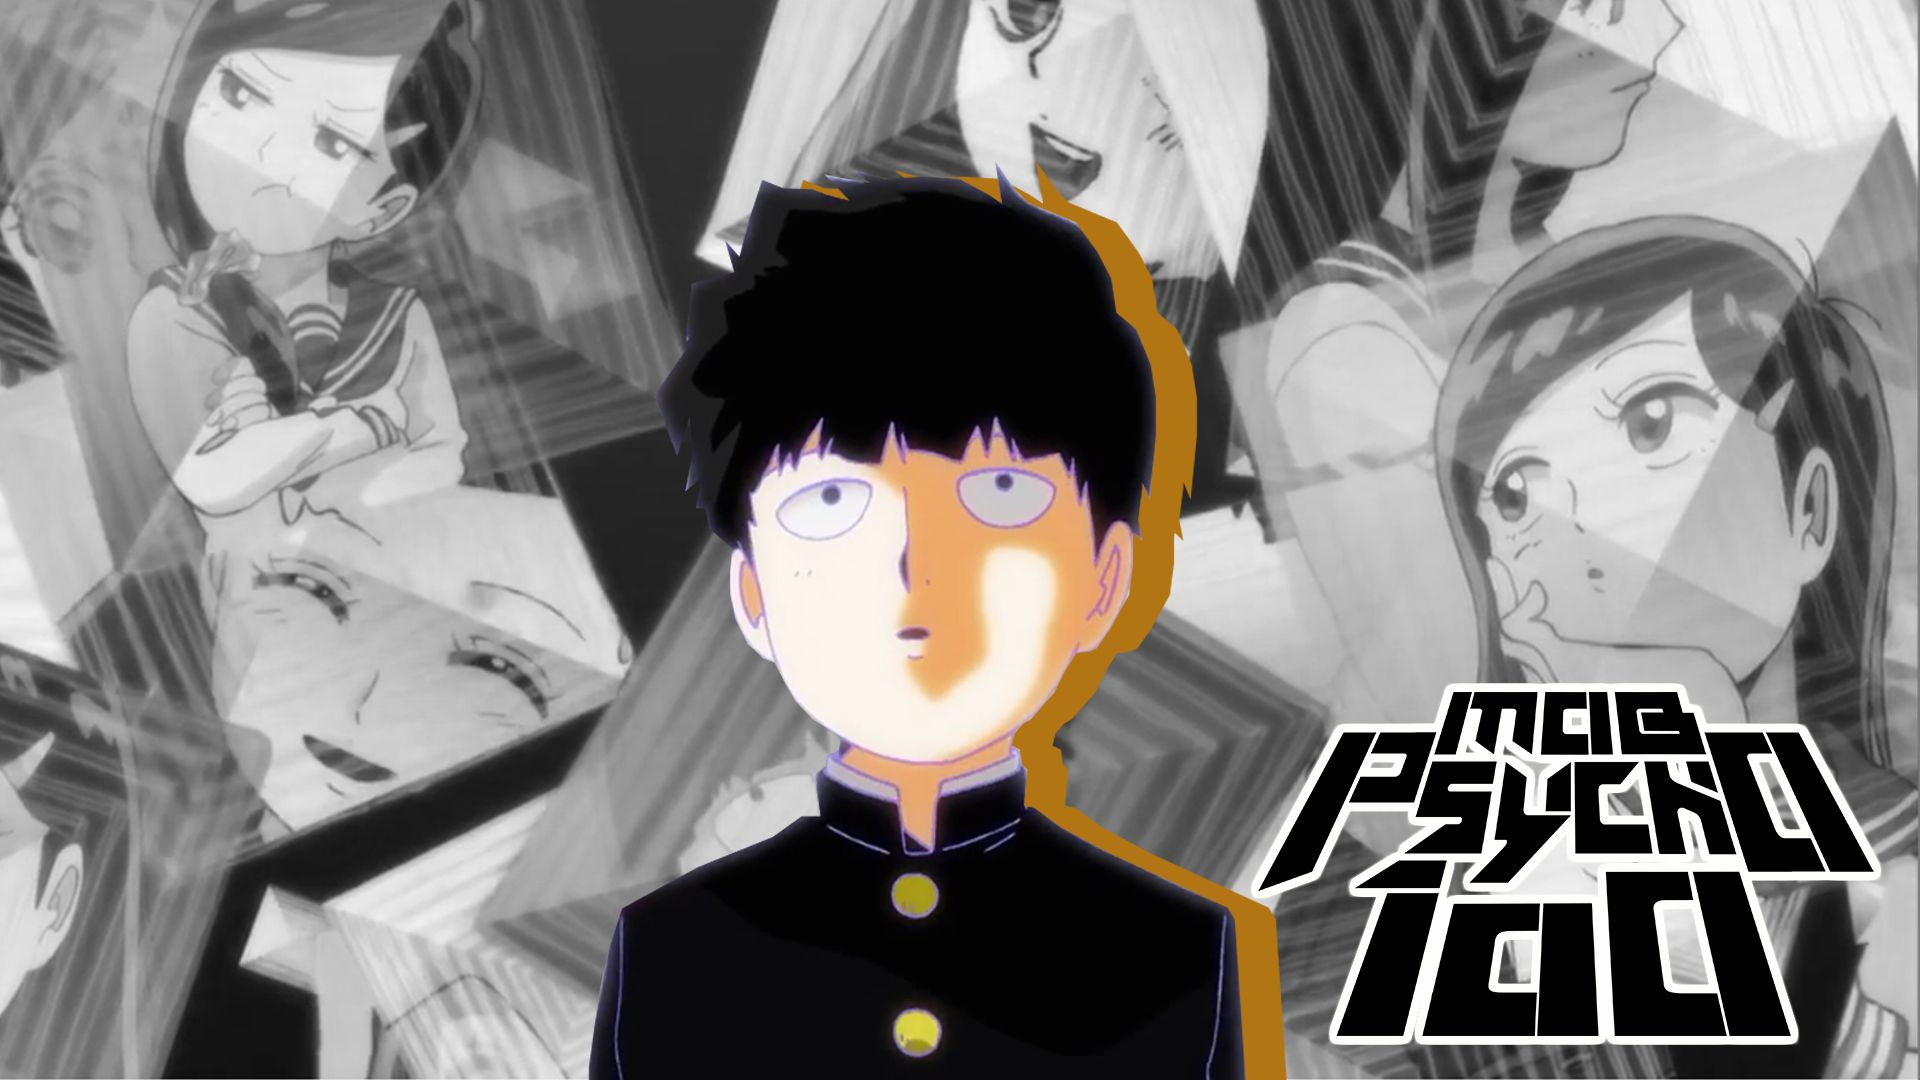 MOB Psycho 100 Anime 2016 Full HD Wallpaper